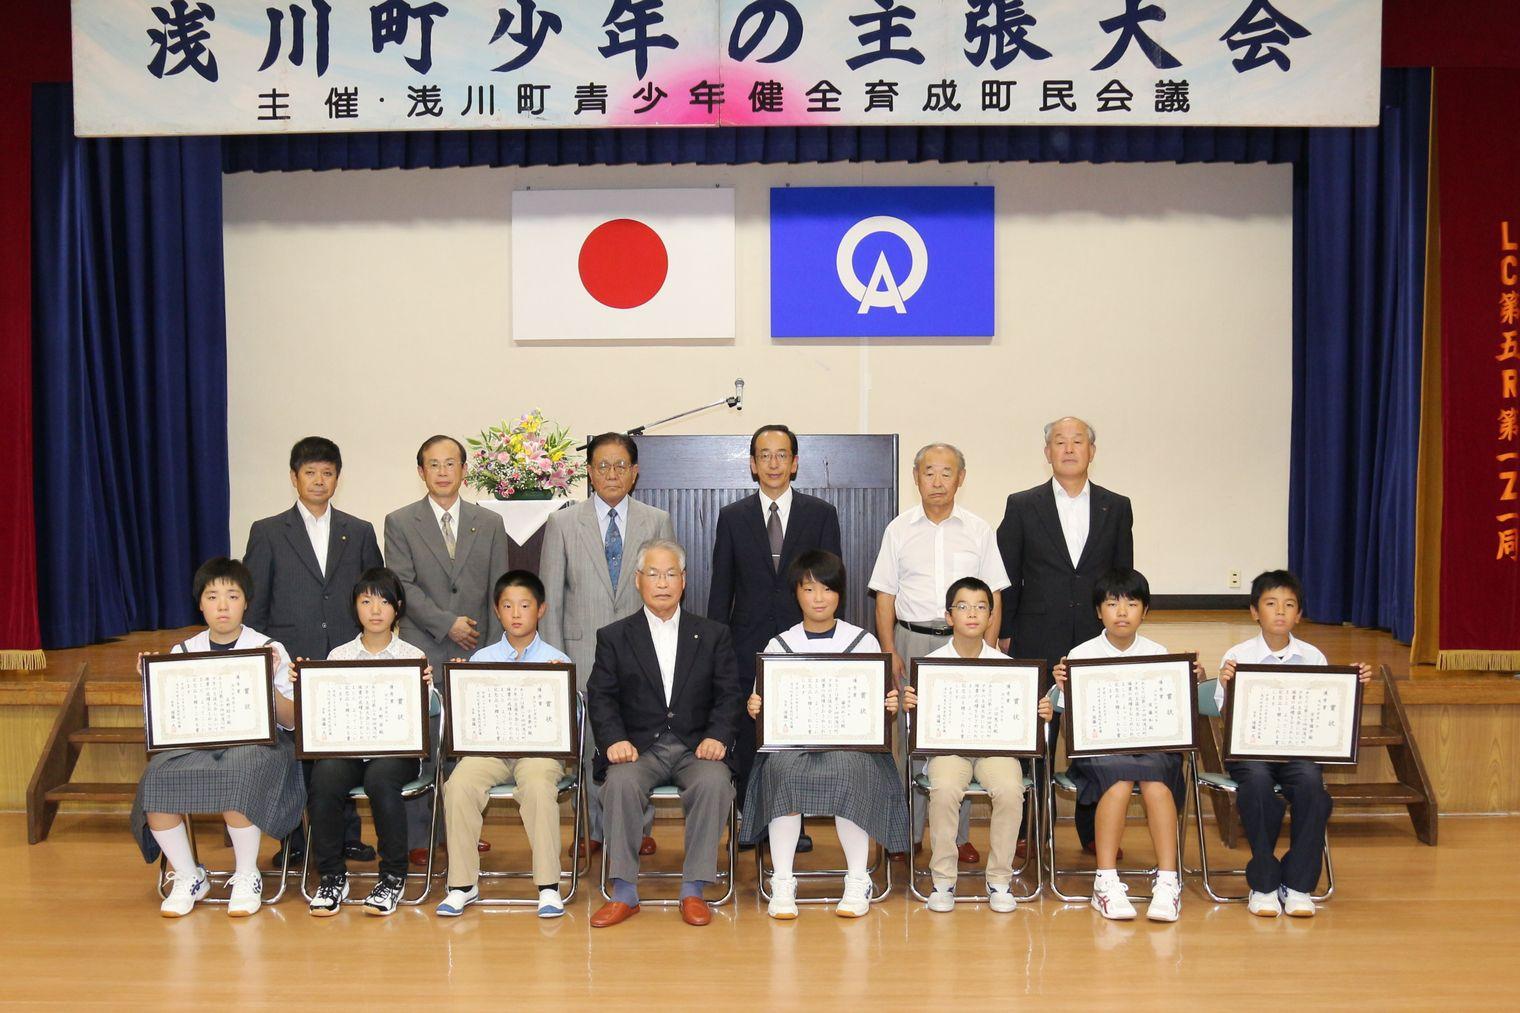 http://www.town.asakawa.fukushima.jp/blog-files/syutyou%20%289%29.JPG